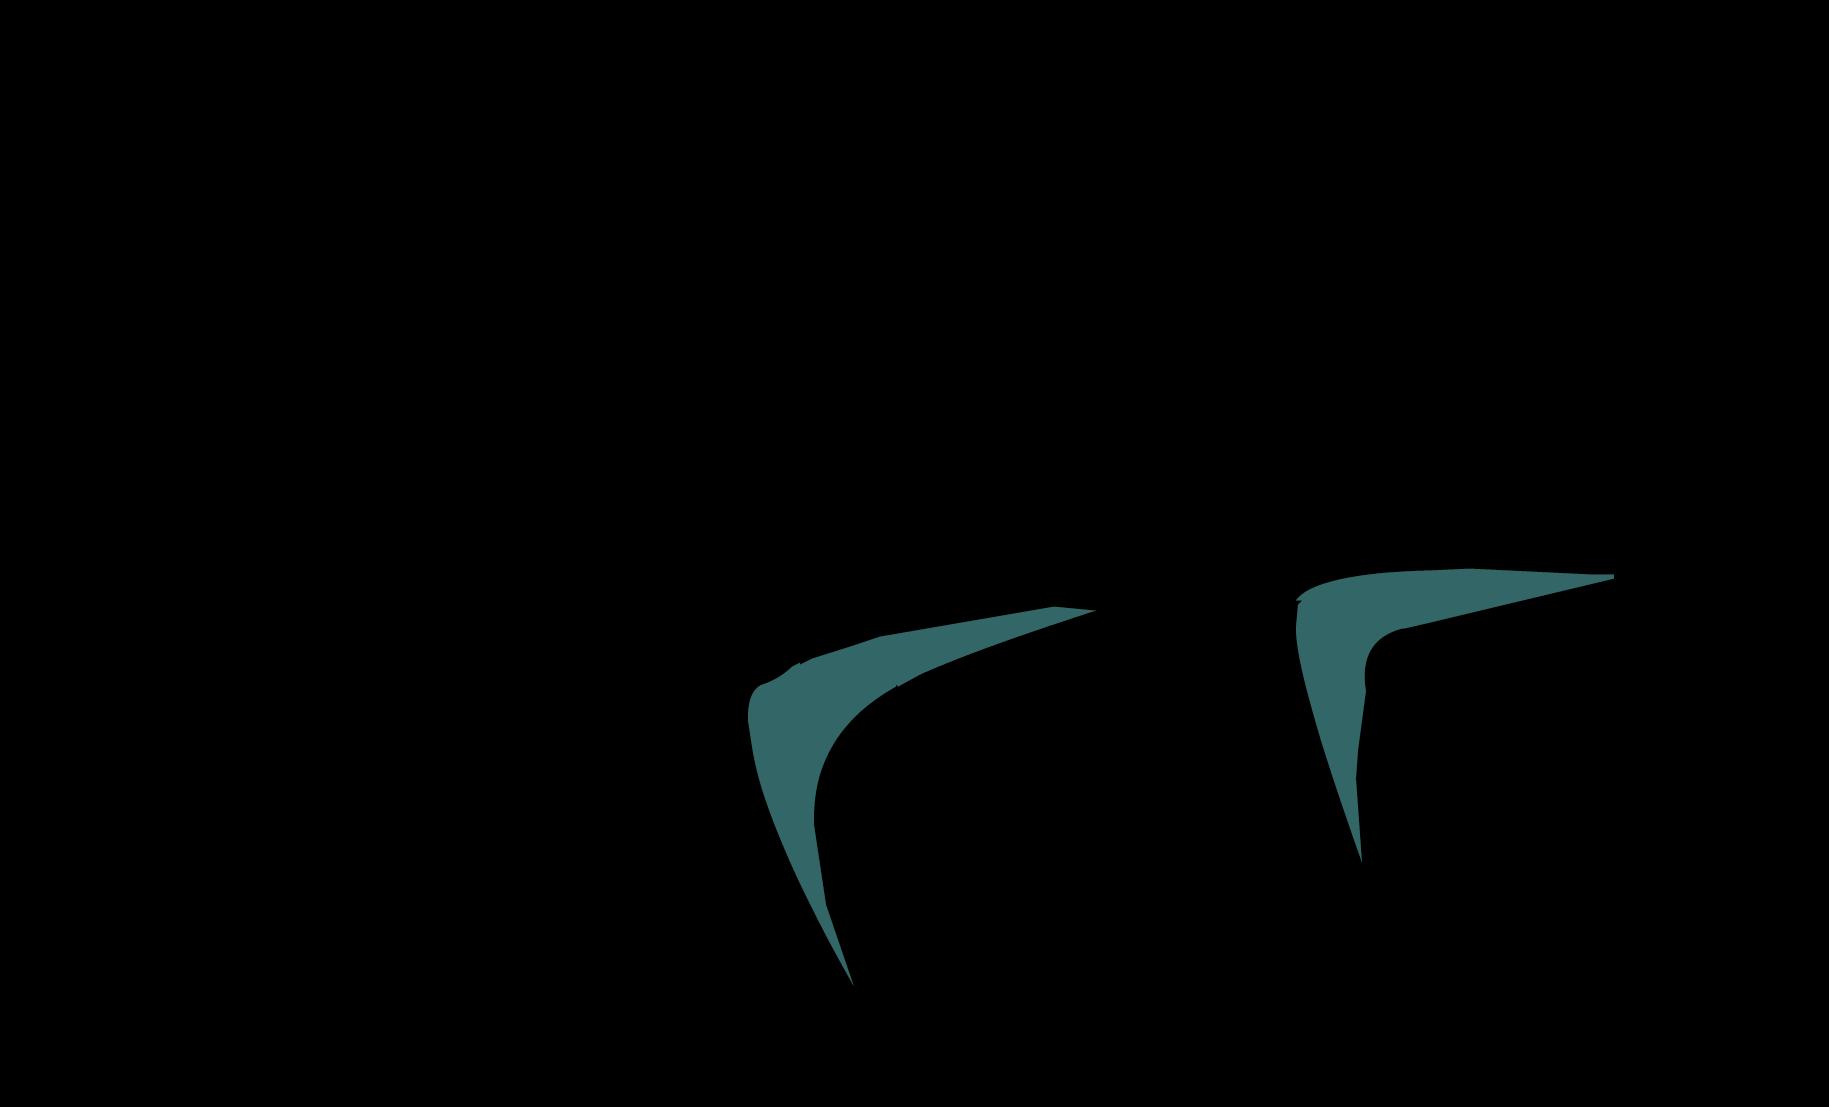 Clipart sunglasses fancy glass. Black club penguin rewritten